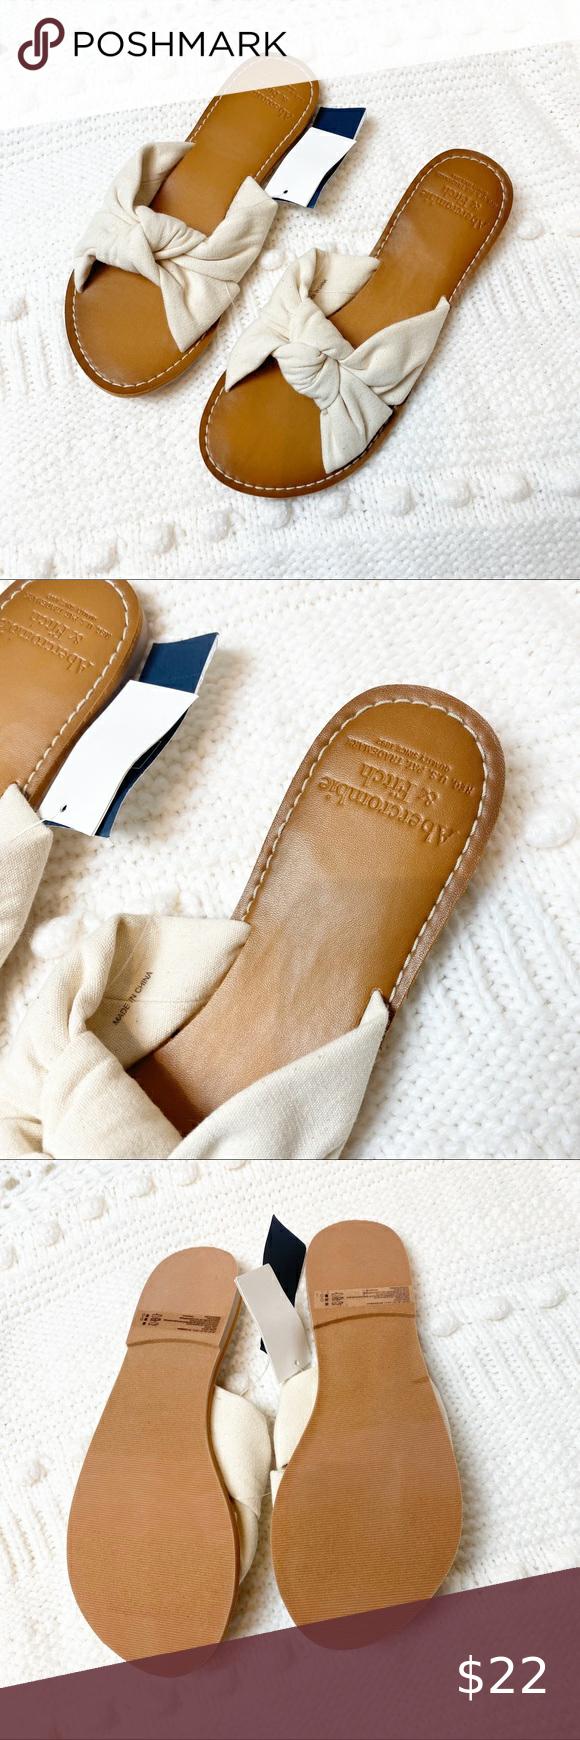 Abercrombie Knot Slide Sandals size 6/7